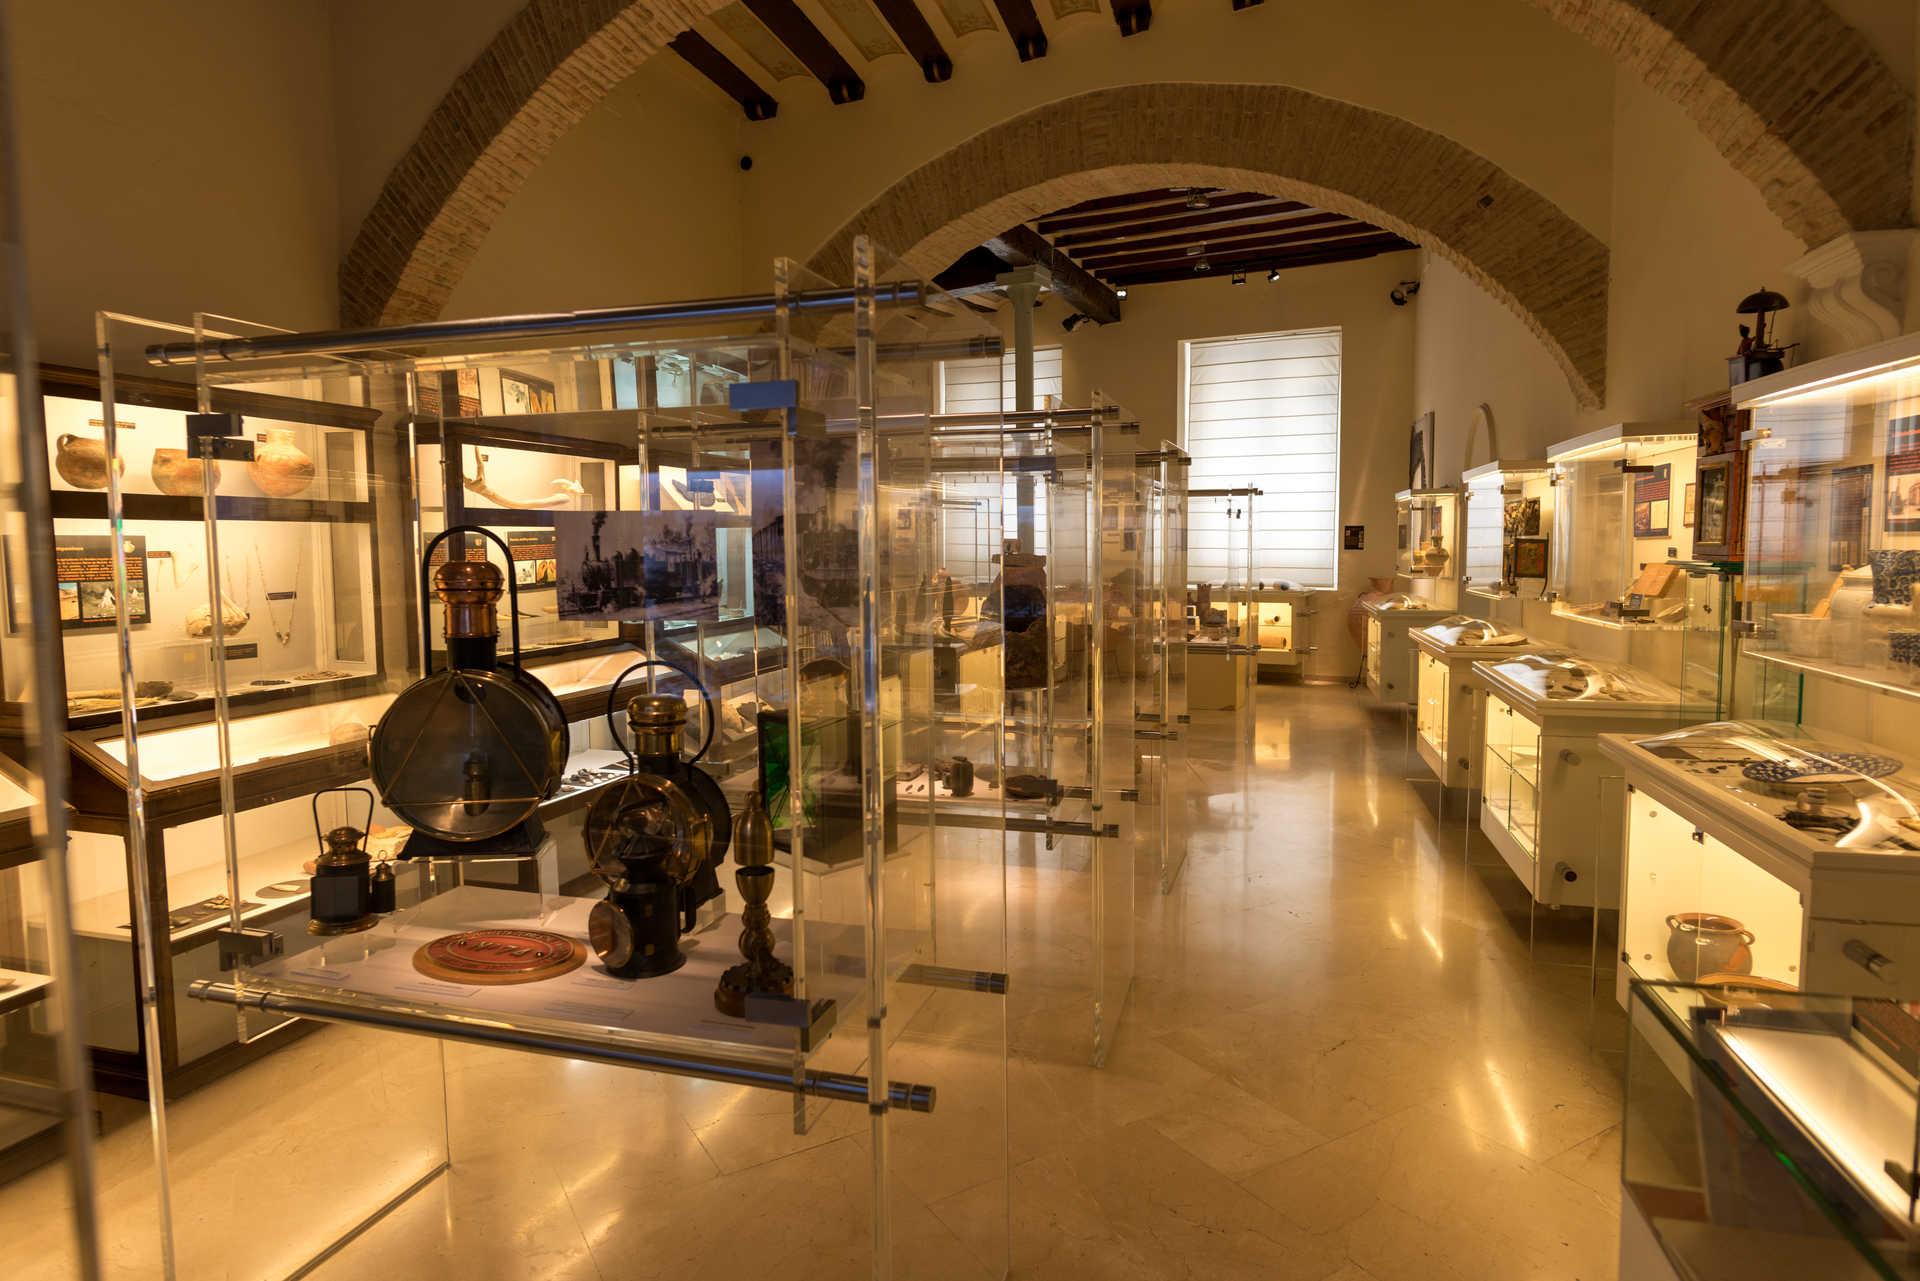 Jose Mª Soler Archeological Museum